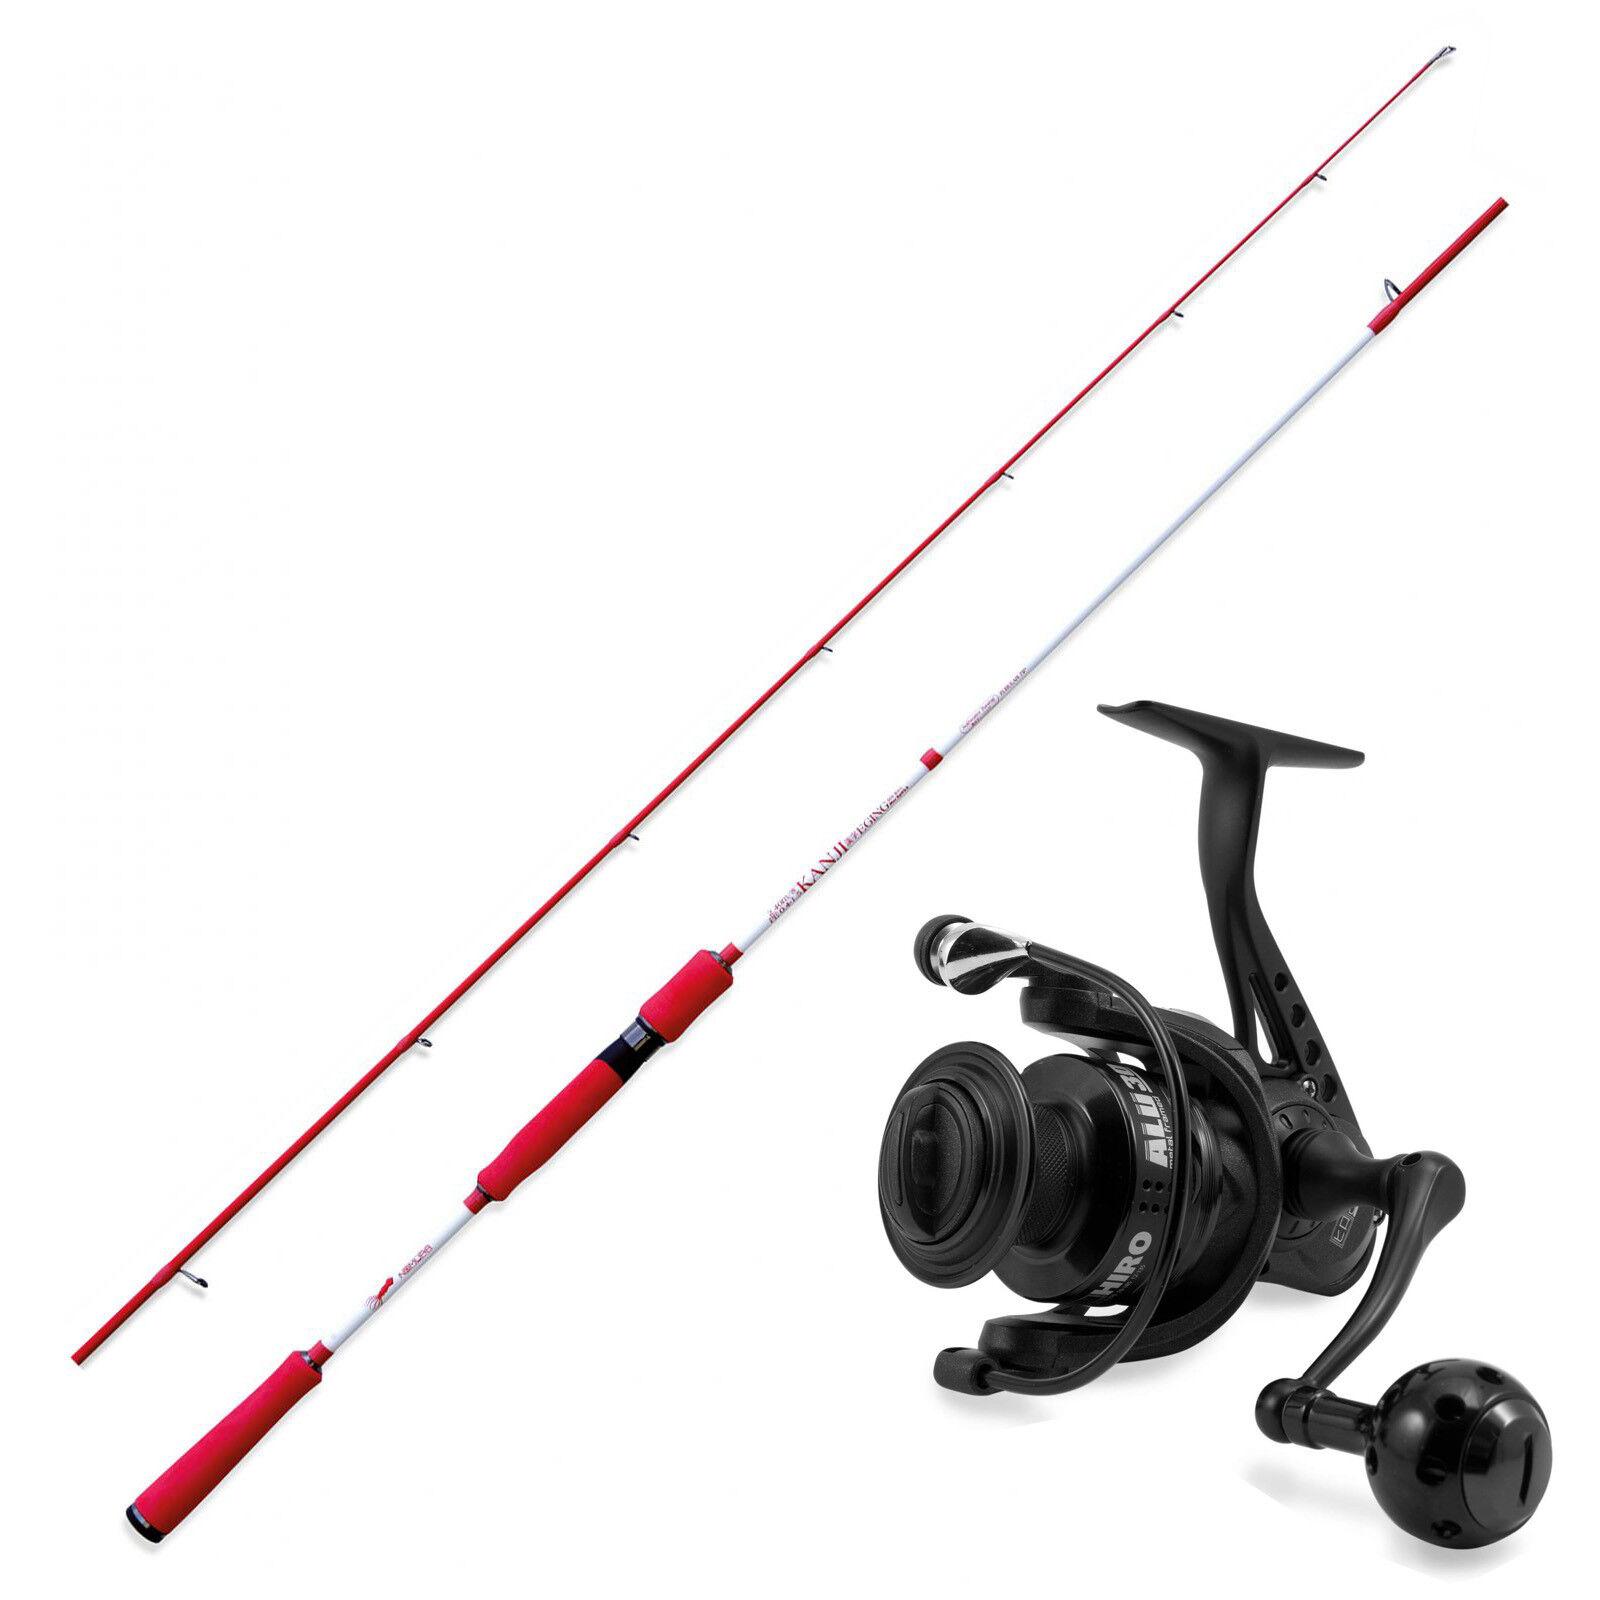 KP3652 Kit Pesca Eging Nomura Canna SW Kanji 240  Mulinello Hiro Alu 4000  CAS